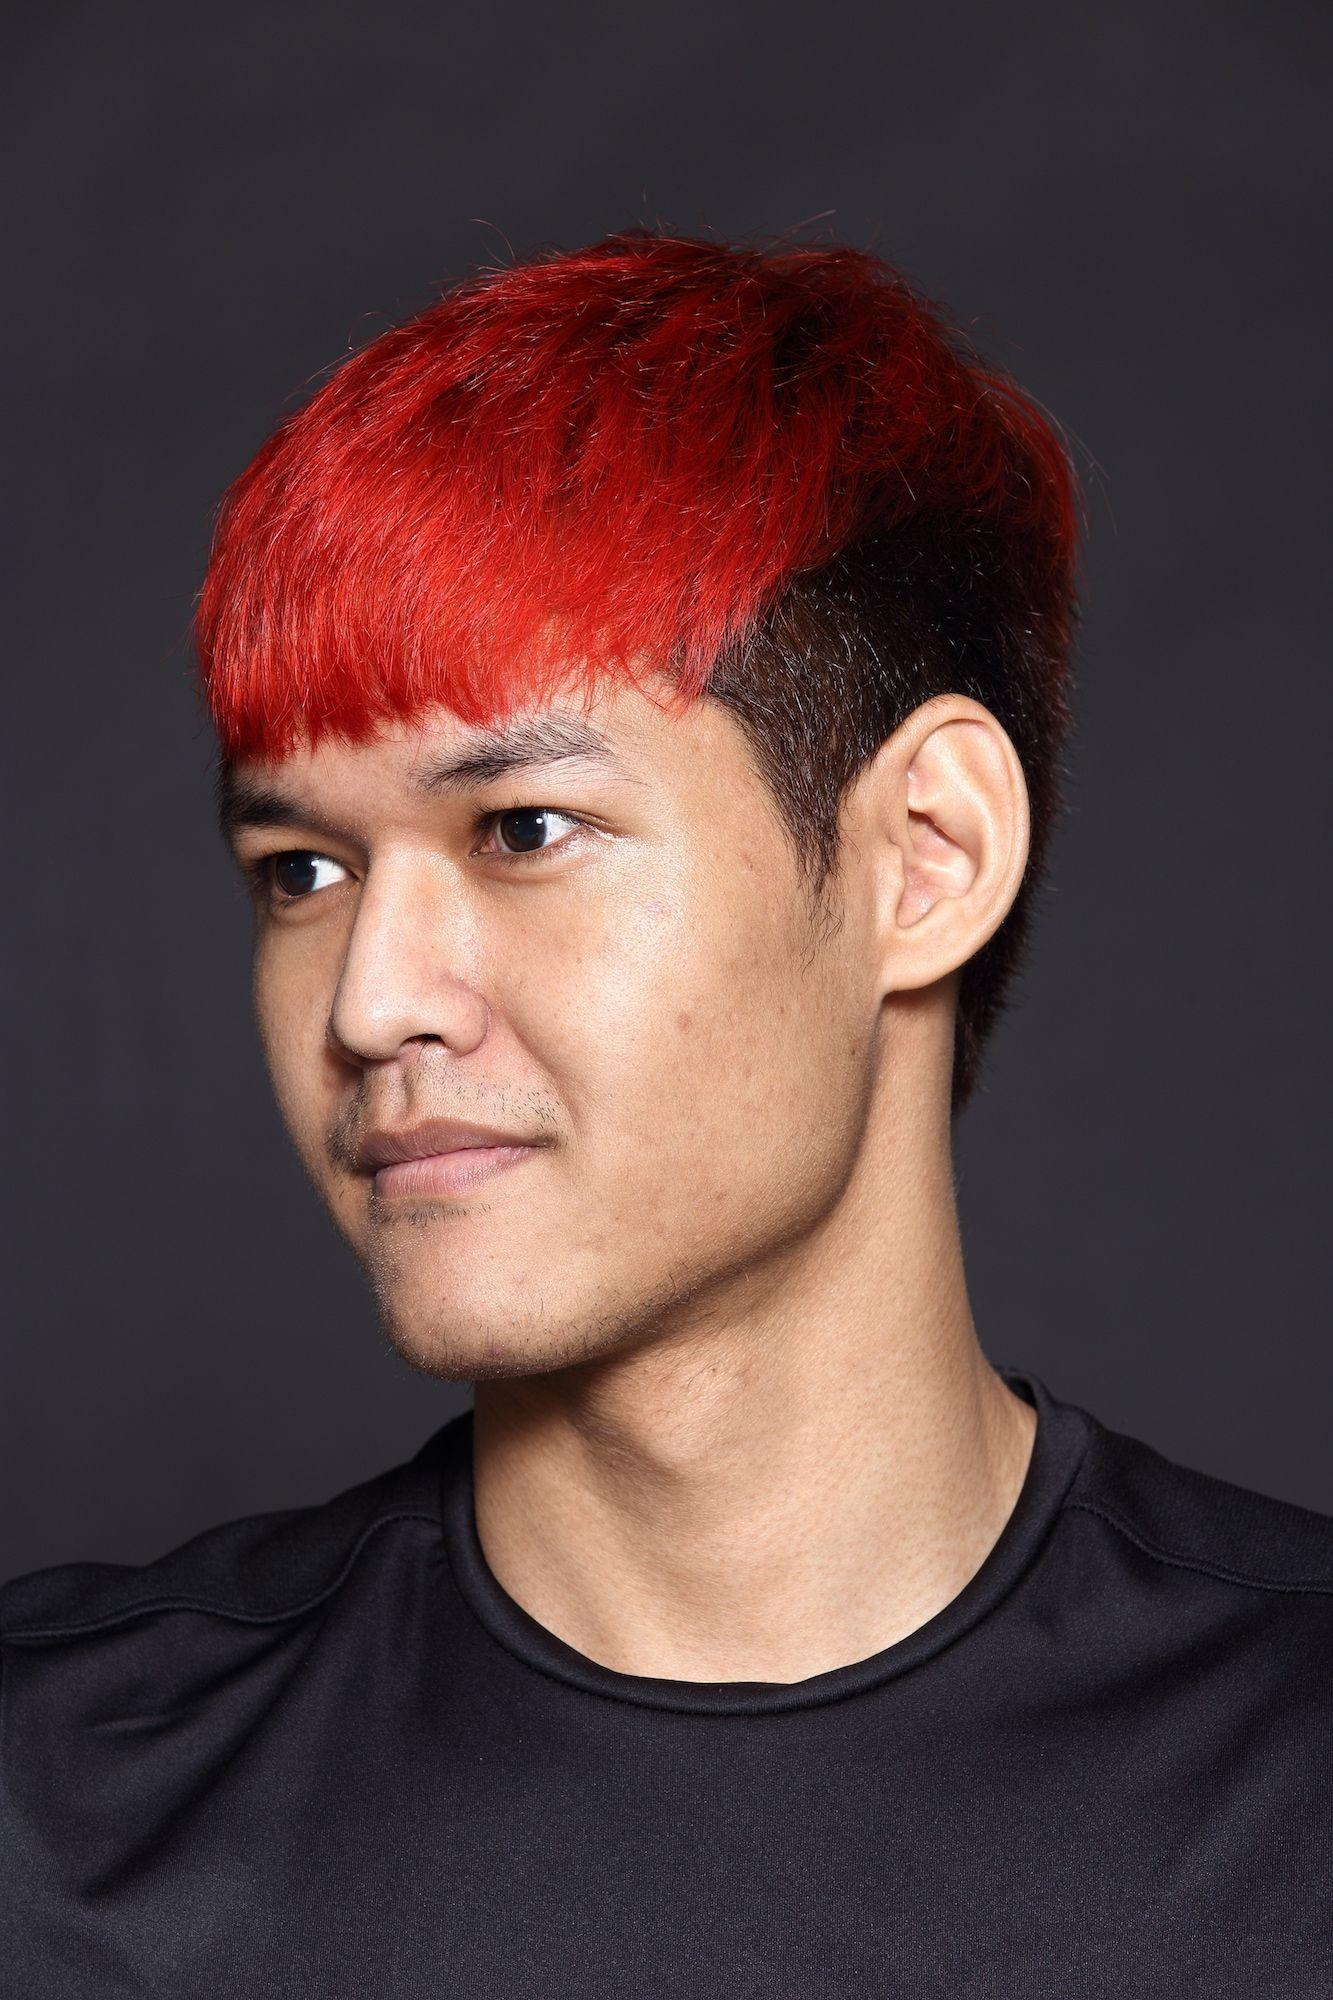 Trend Warna Rambut Pria 2018 Warna Rambut Merah Warna Rambut Rambut Pria Warna Rambut Merah